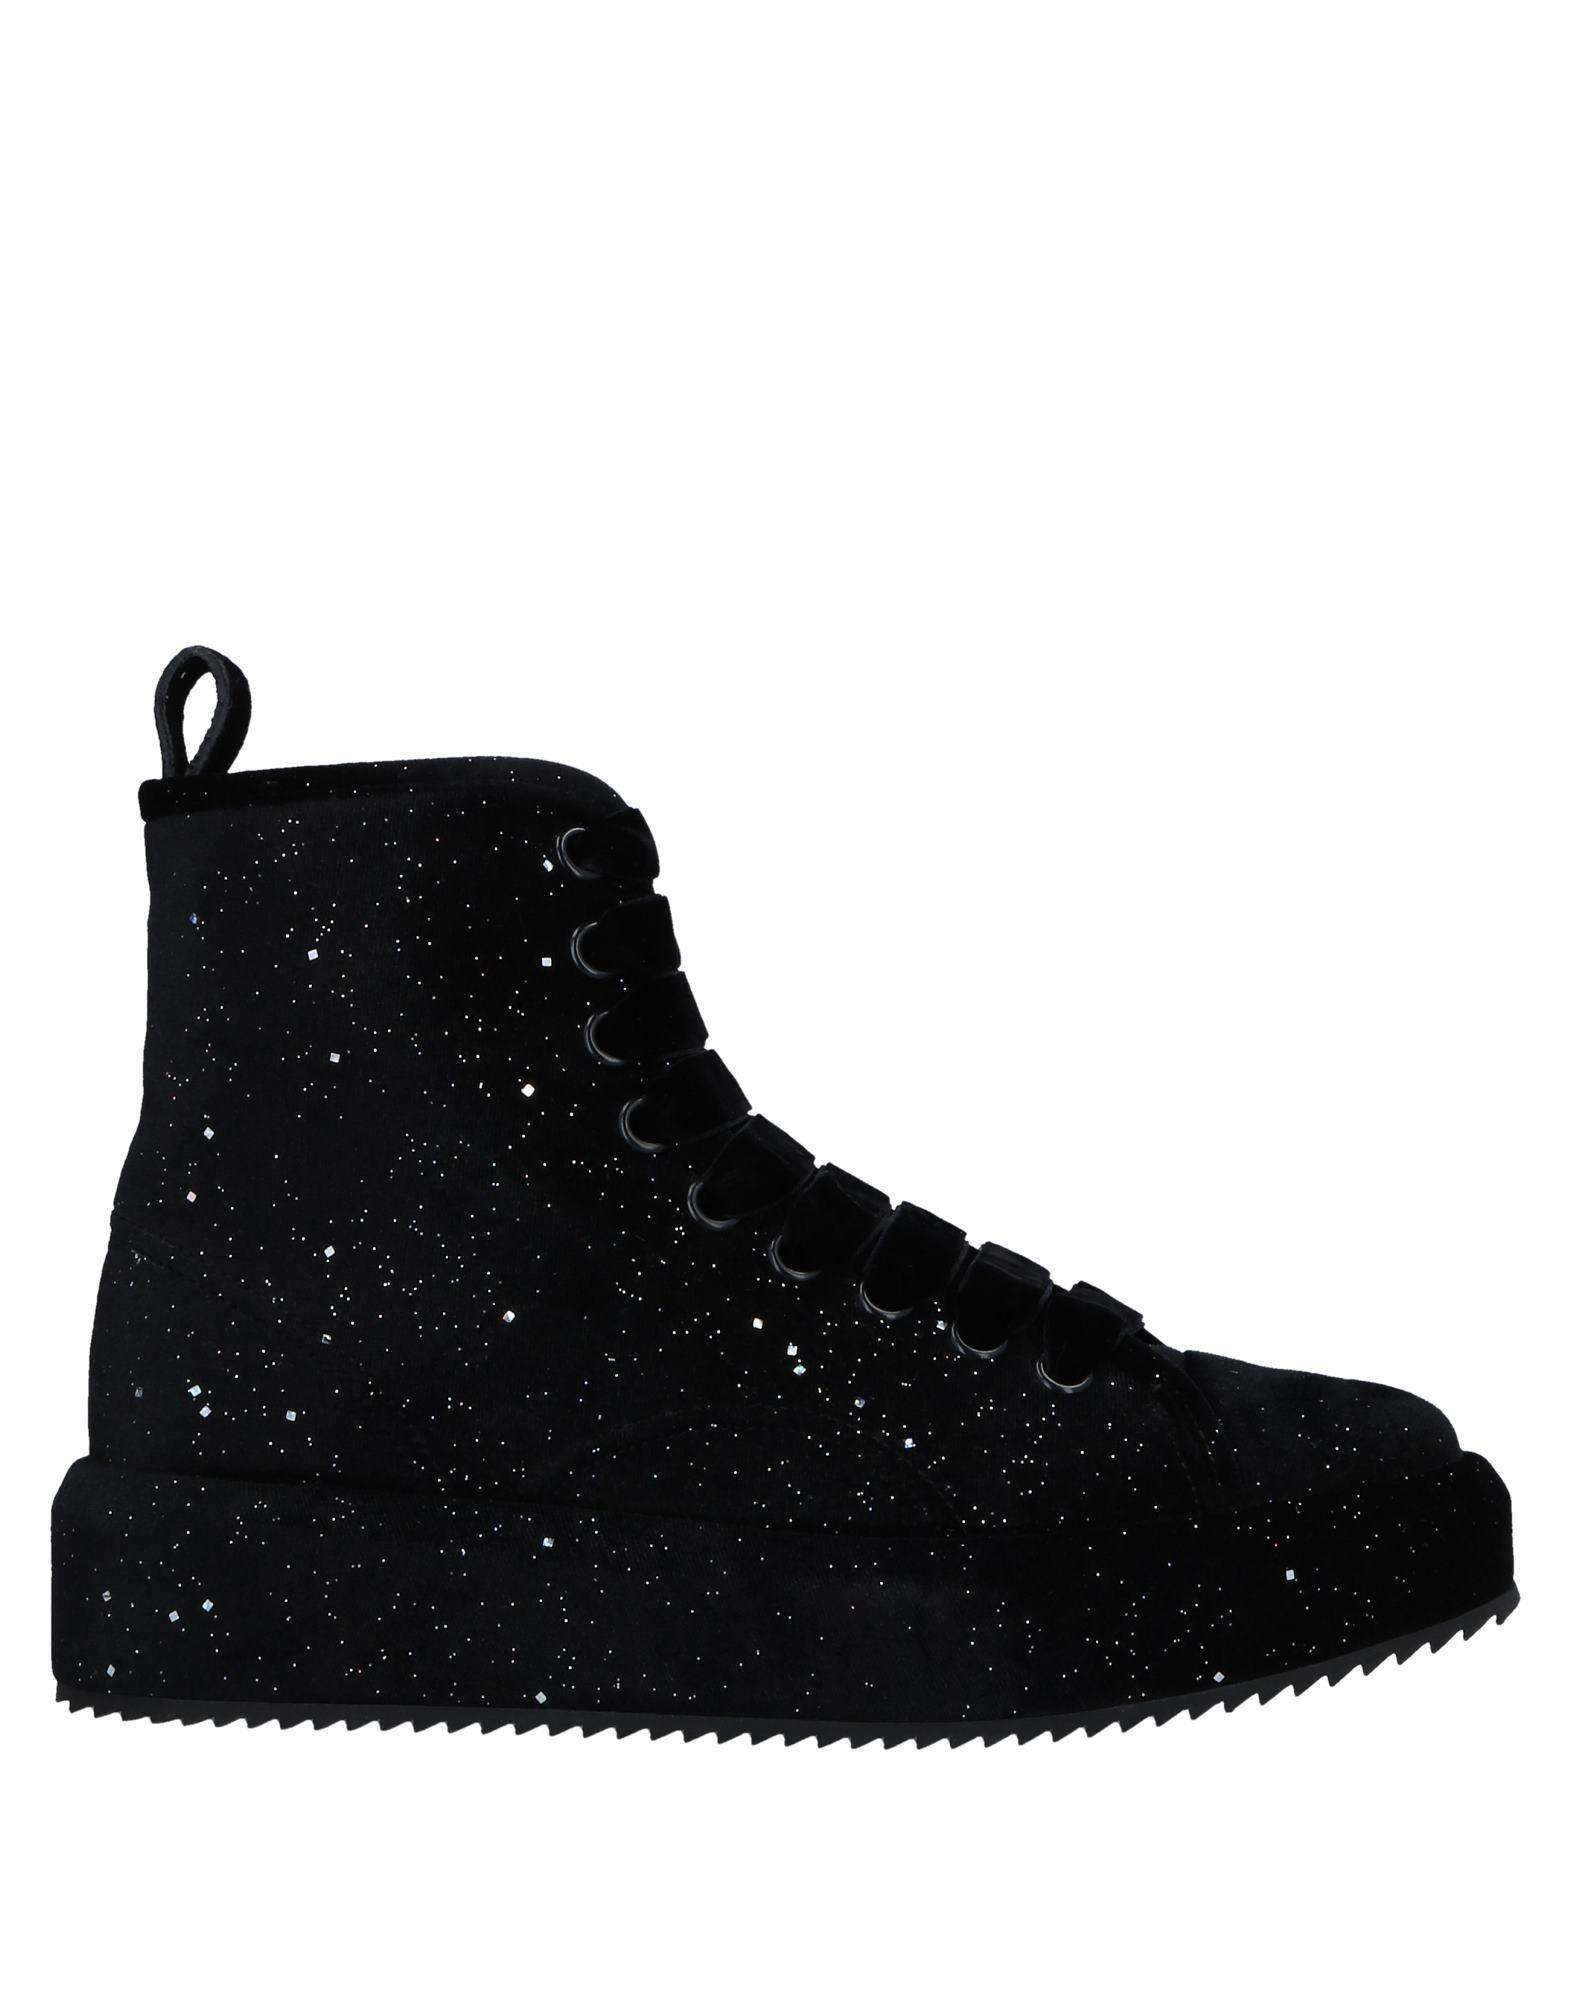 Marco De Vincenzo Stiefelette Damen  11517801IVGünstige gut aussehende Schuhe